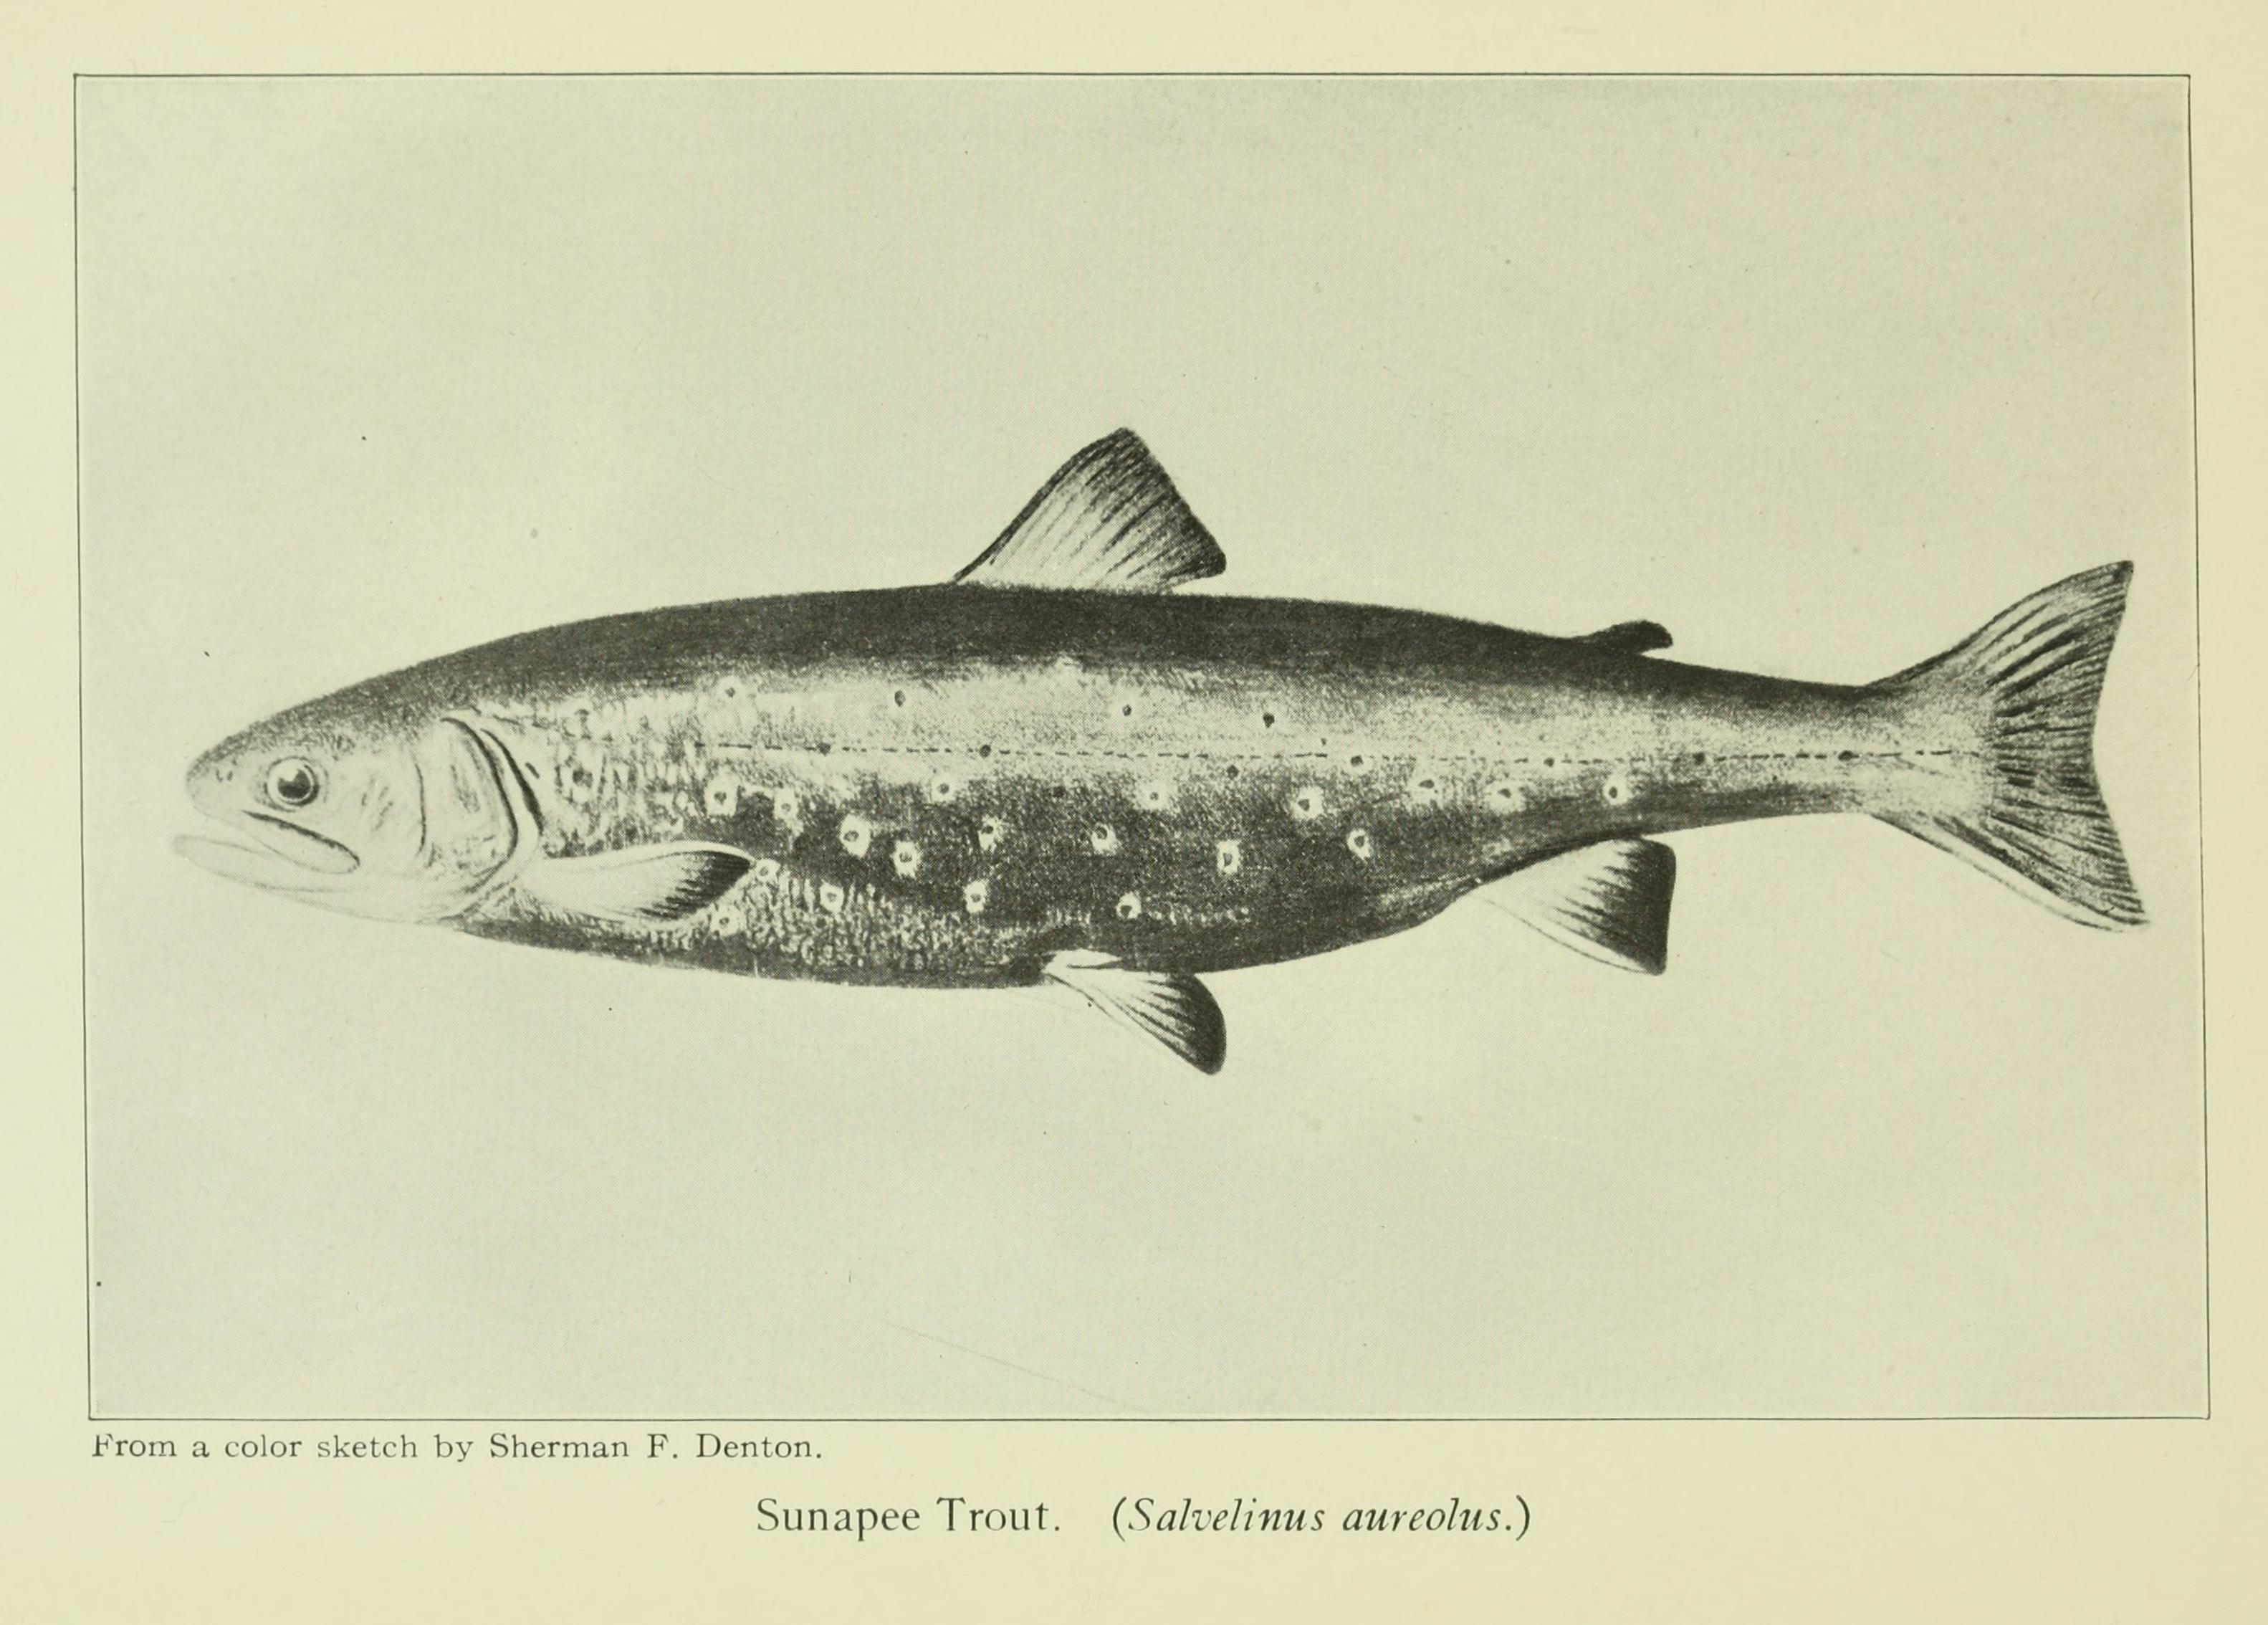 Image of arctic char